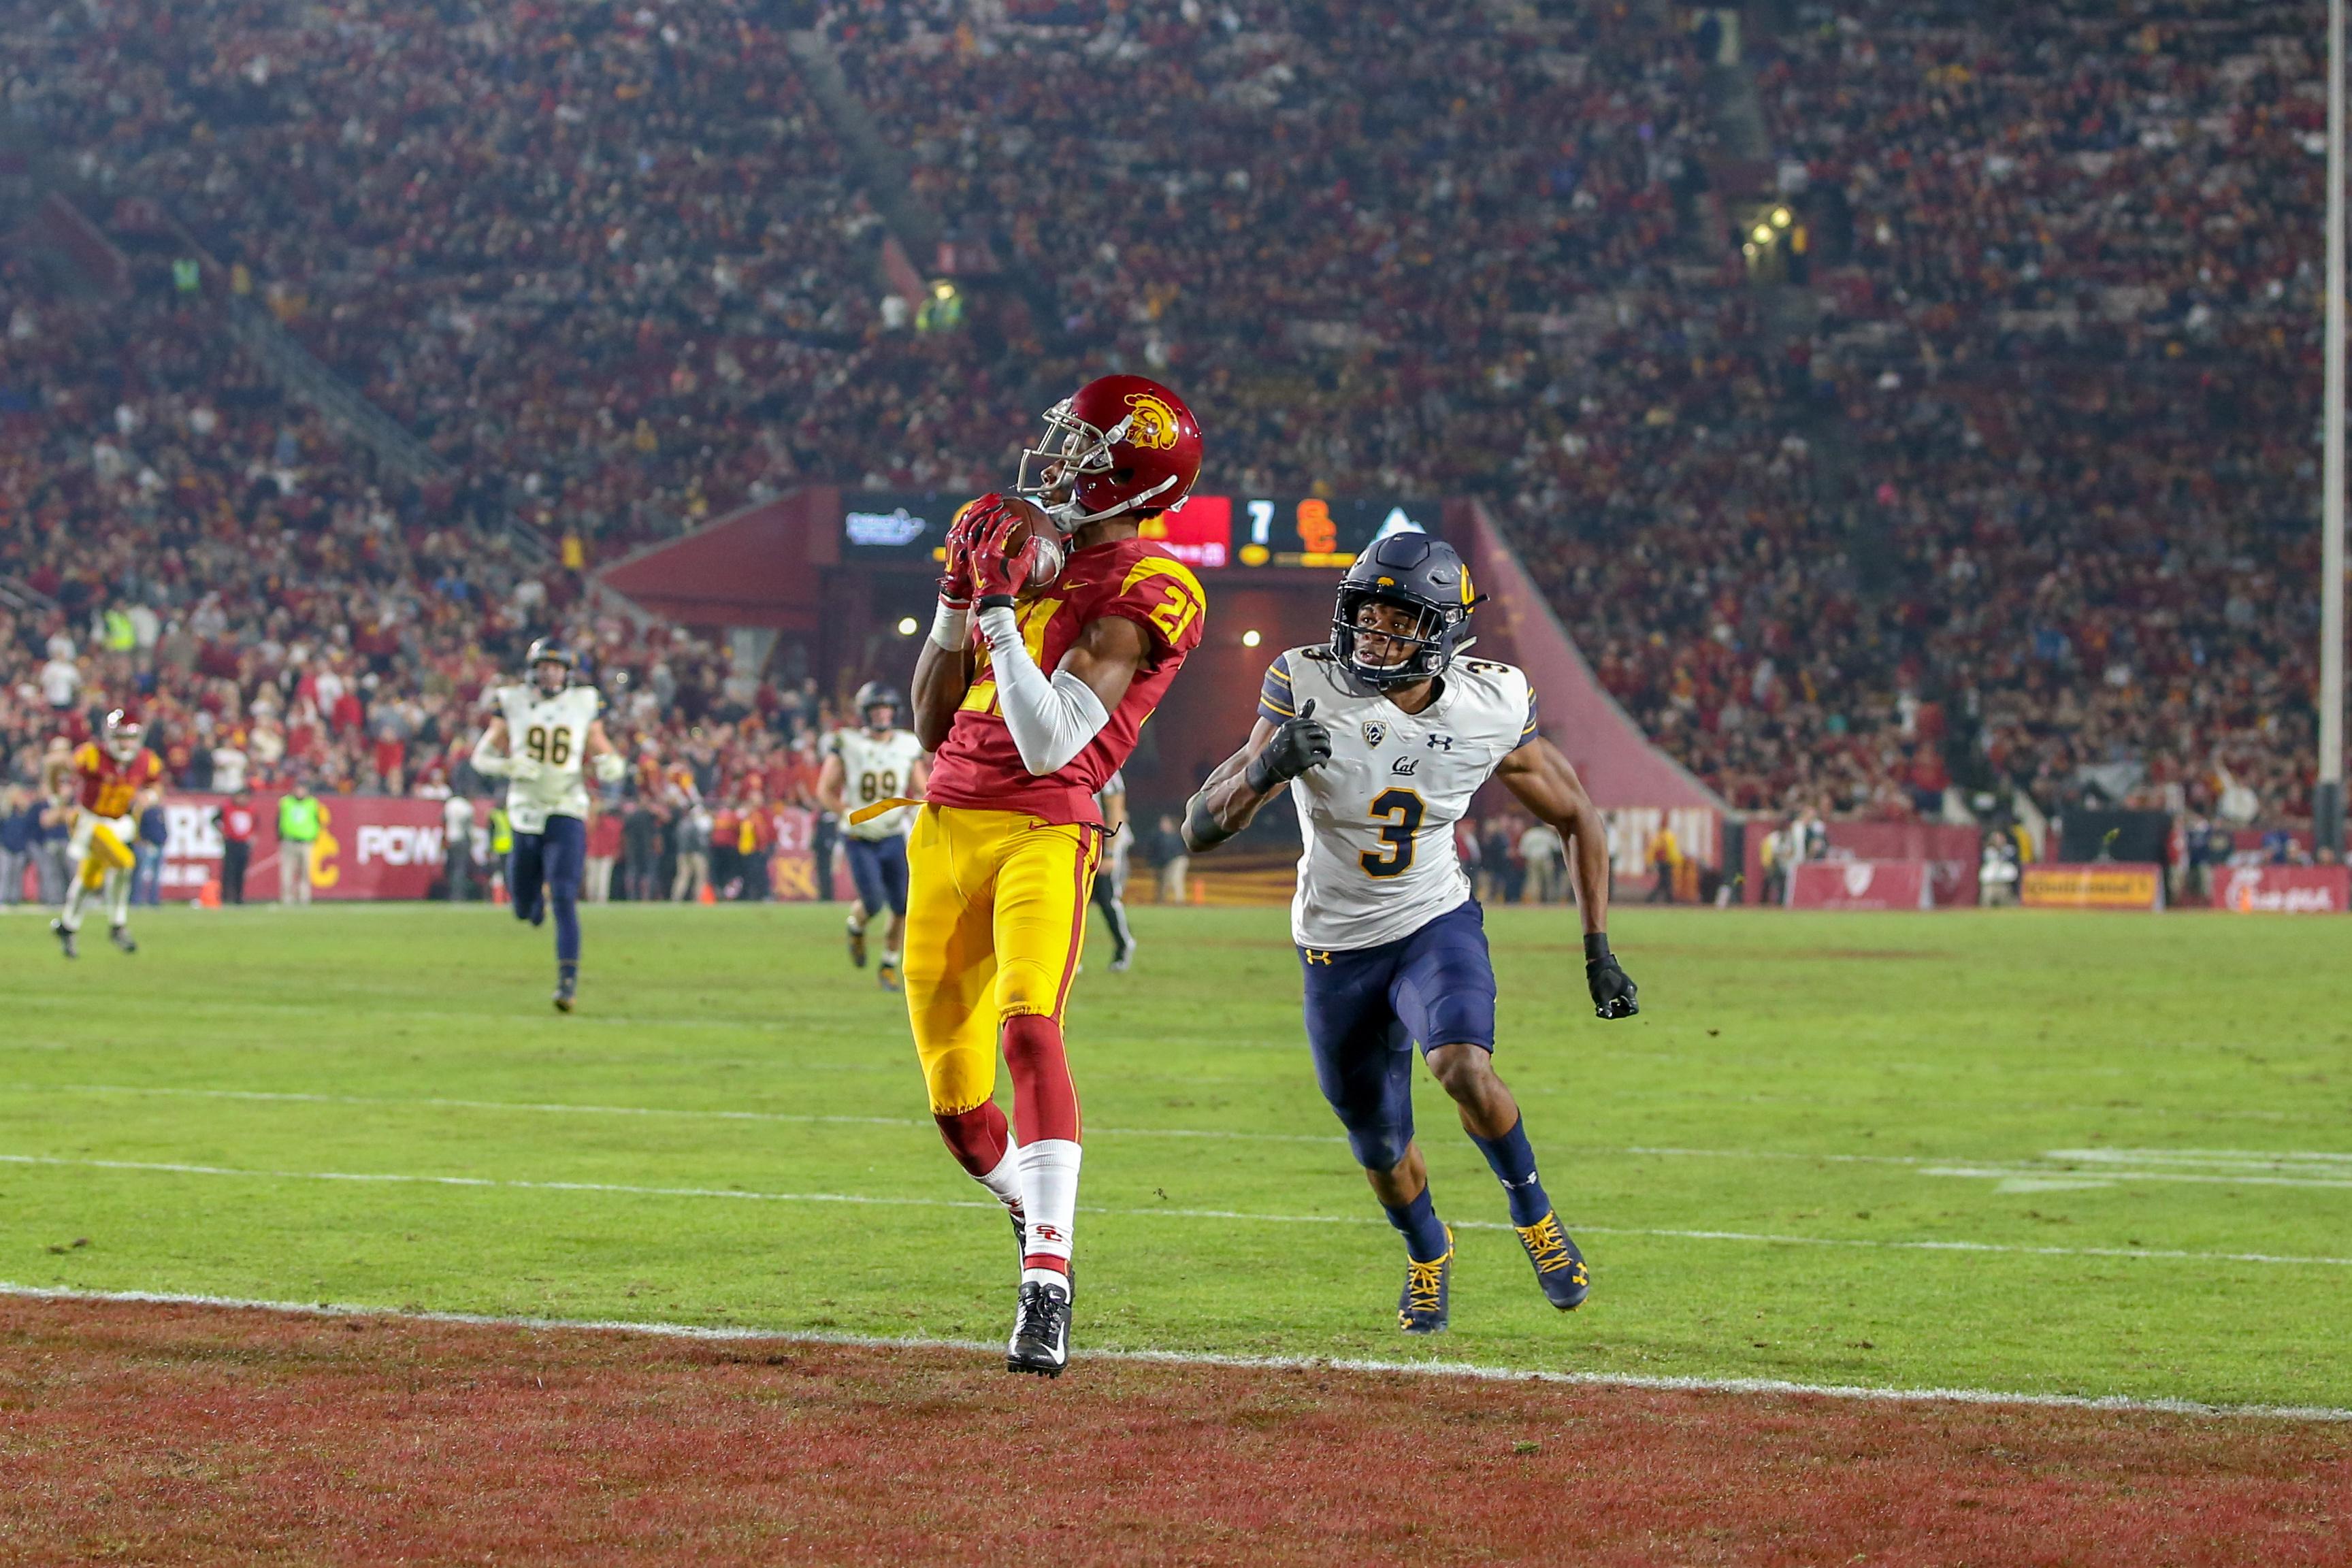 COLLEGE FOOTBALL: NOV 10 Cal at USC